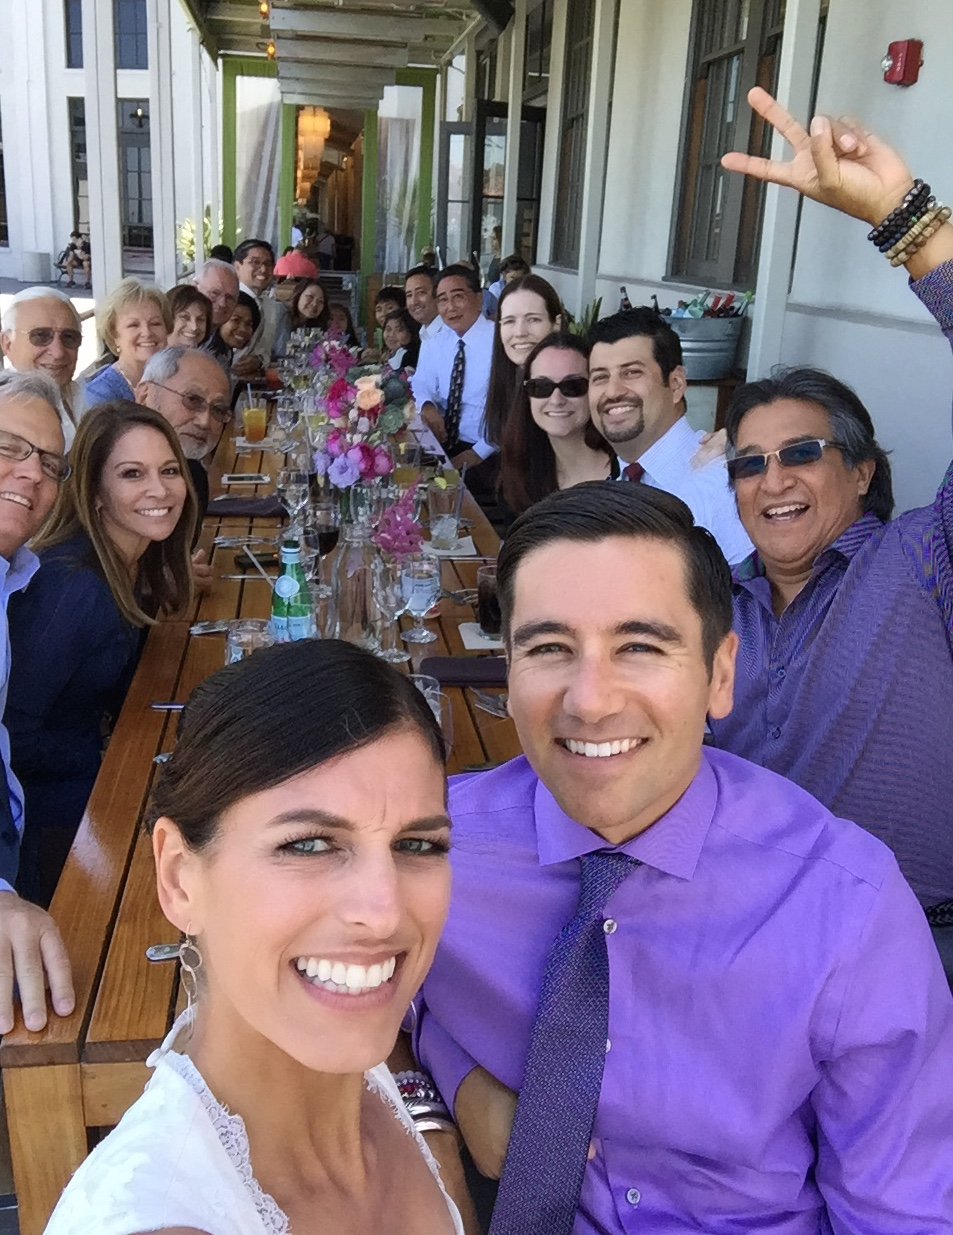 Wedding Selfie, The Plant Cafe, Pier 3, San Francisco